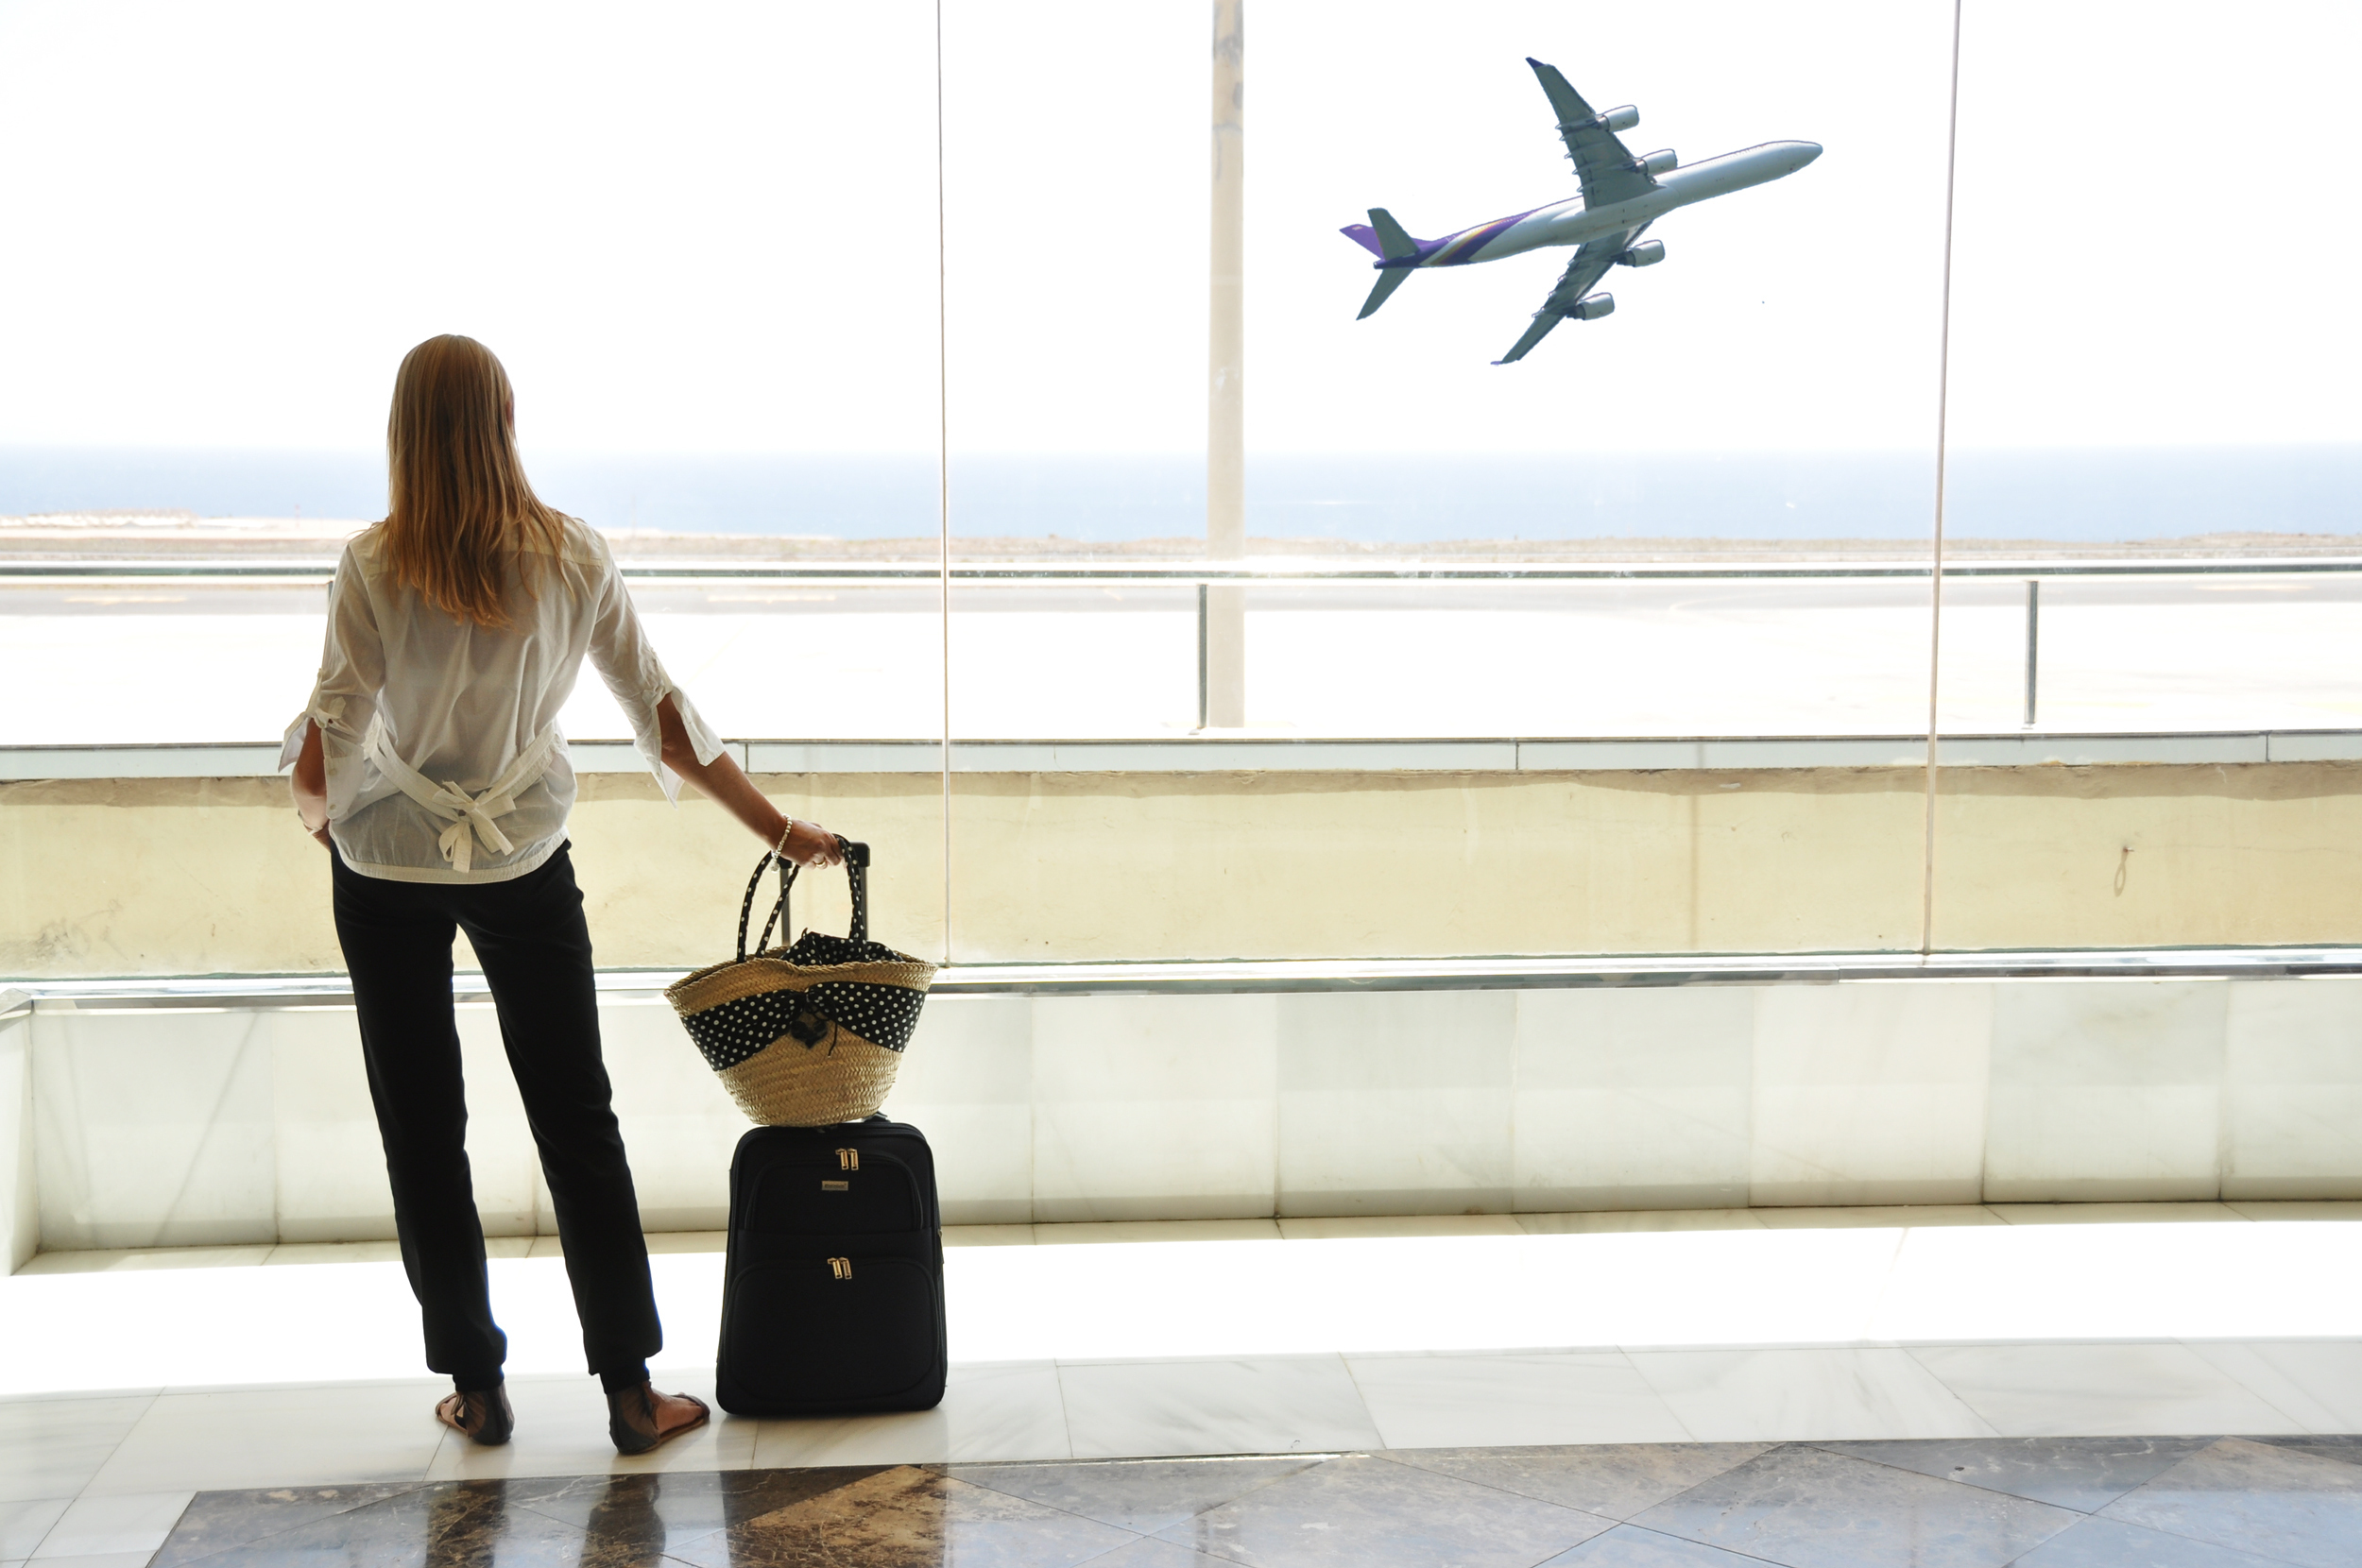 bigstock-girl-at-the-airport-window-loo-26611490